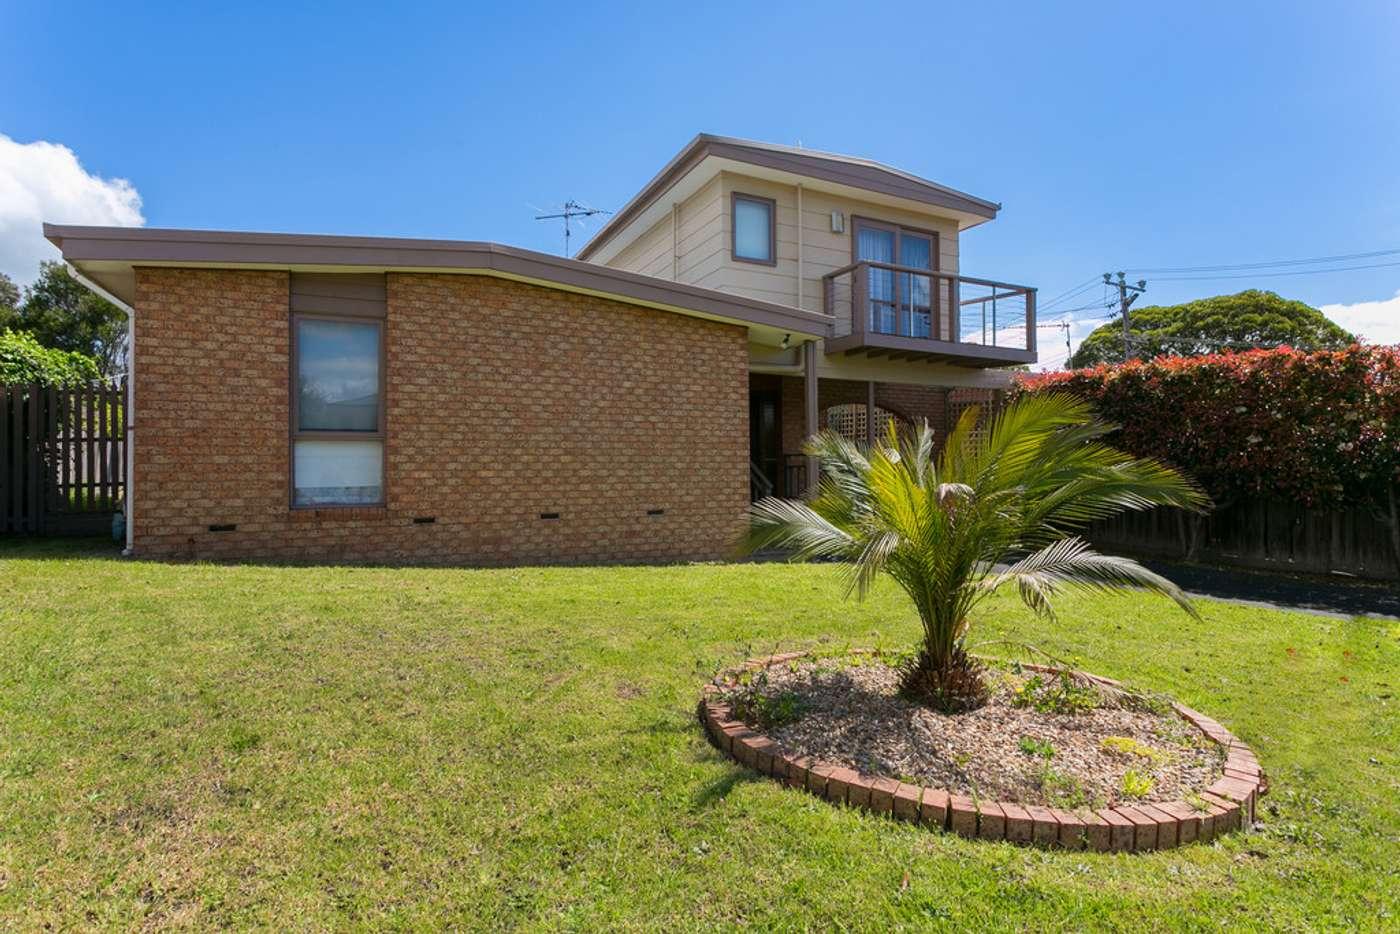 Main view of Homely house listing, 6 Frieda Street, Dromana VIC 3936